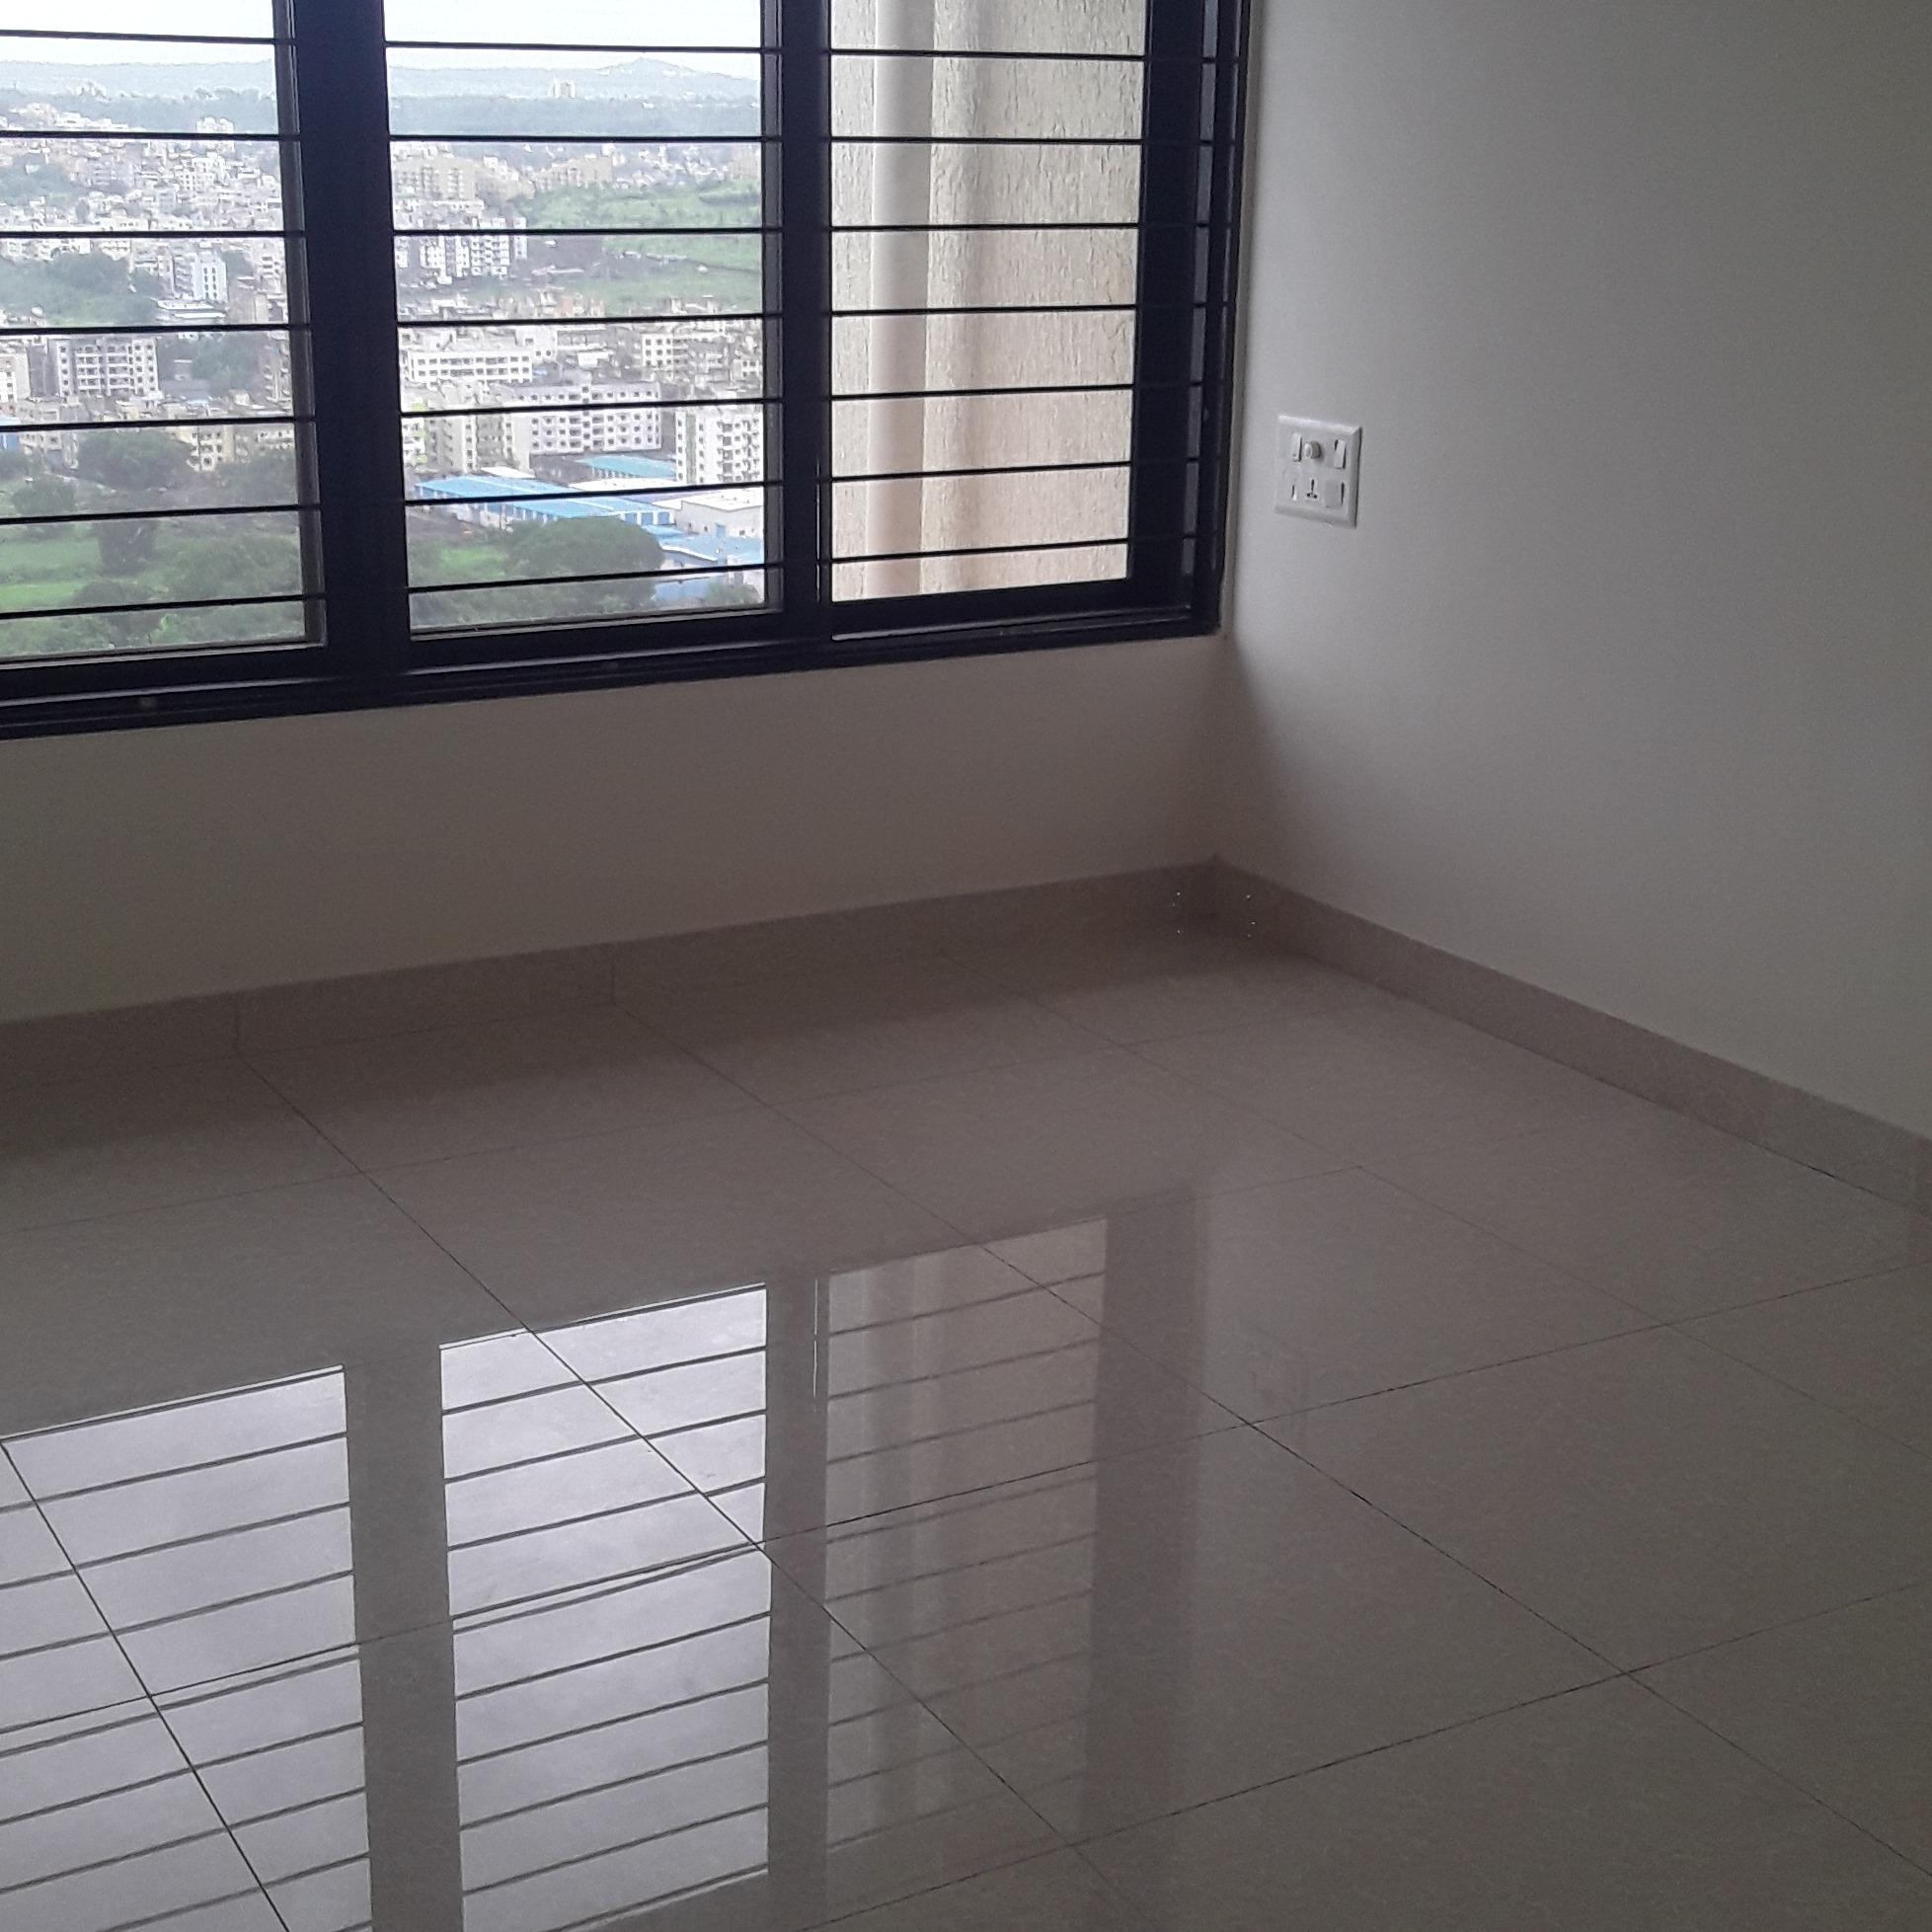 3 BHK 1480 Sq.Ft. Apartment in Magarpatta Nanded City Sargam